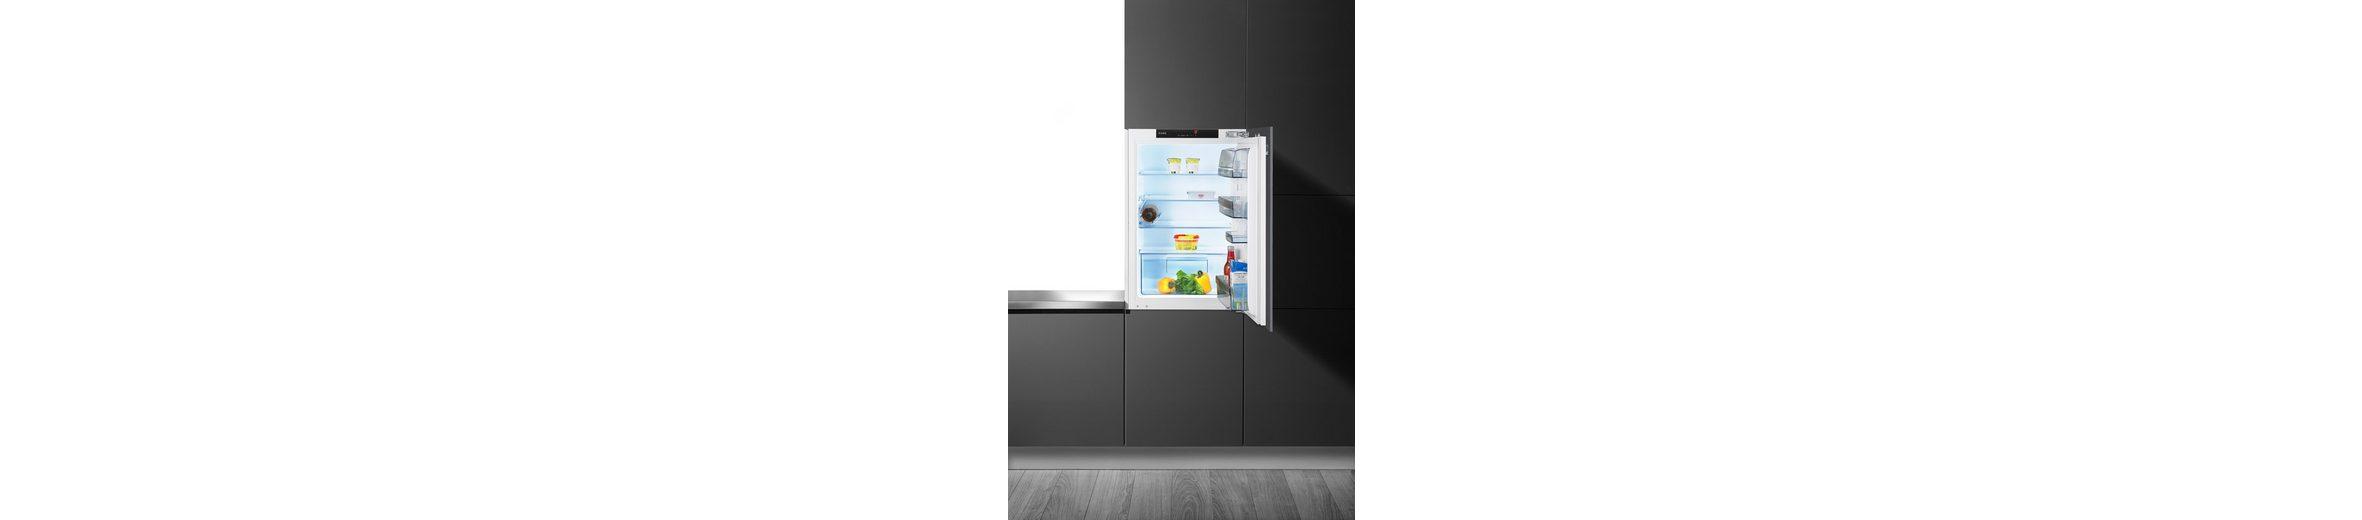 AEG Einbaukühlschrank SANTO SKS98800C4, A+++, 87,3 cm hoch